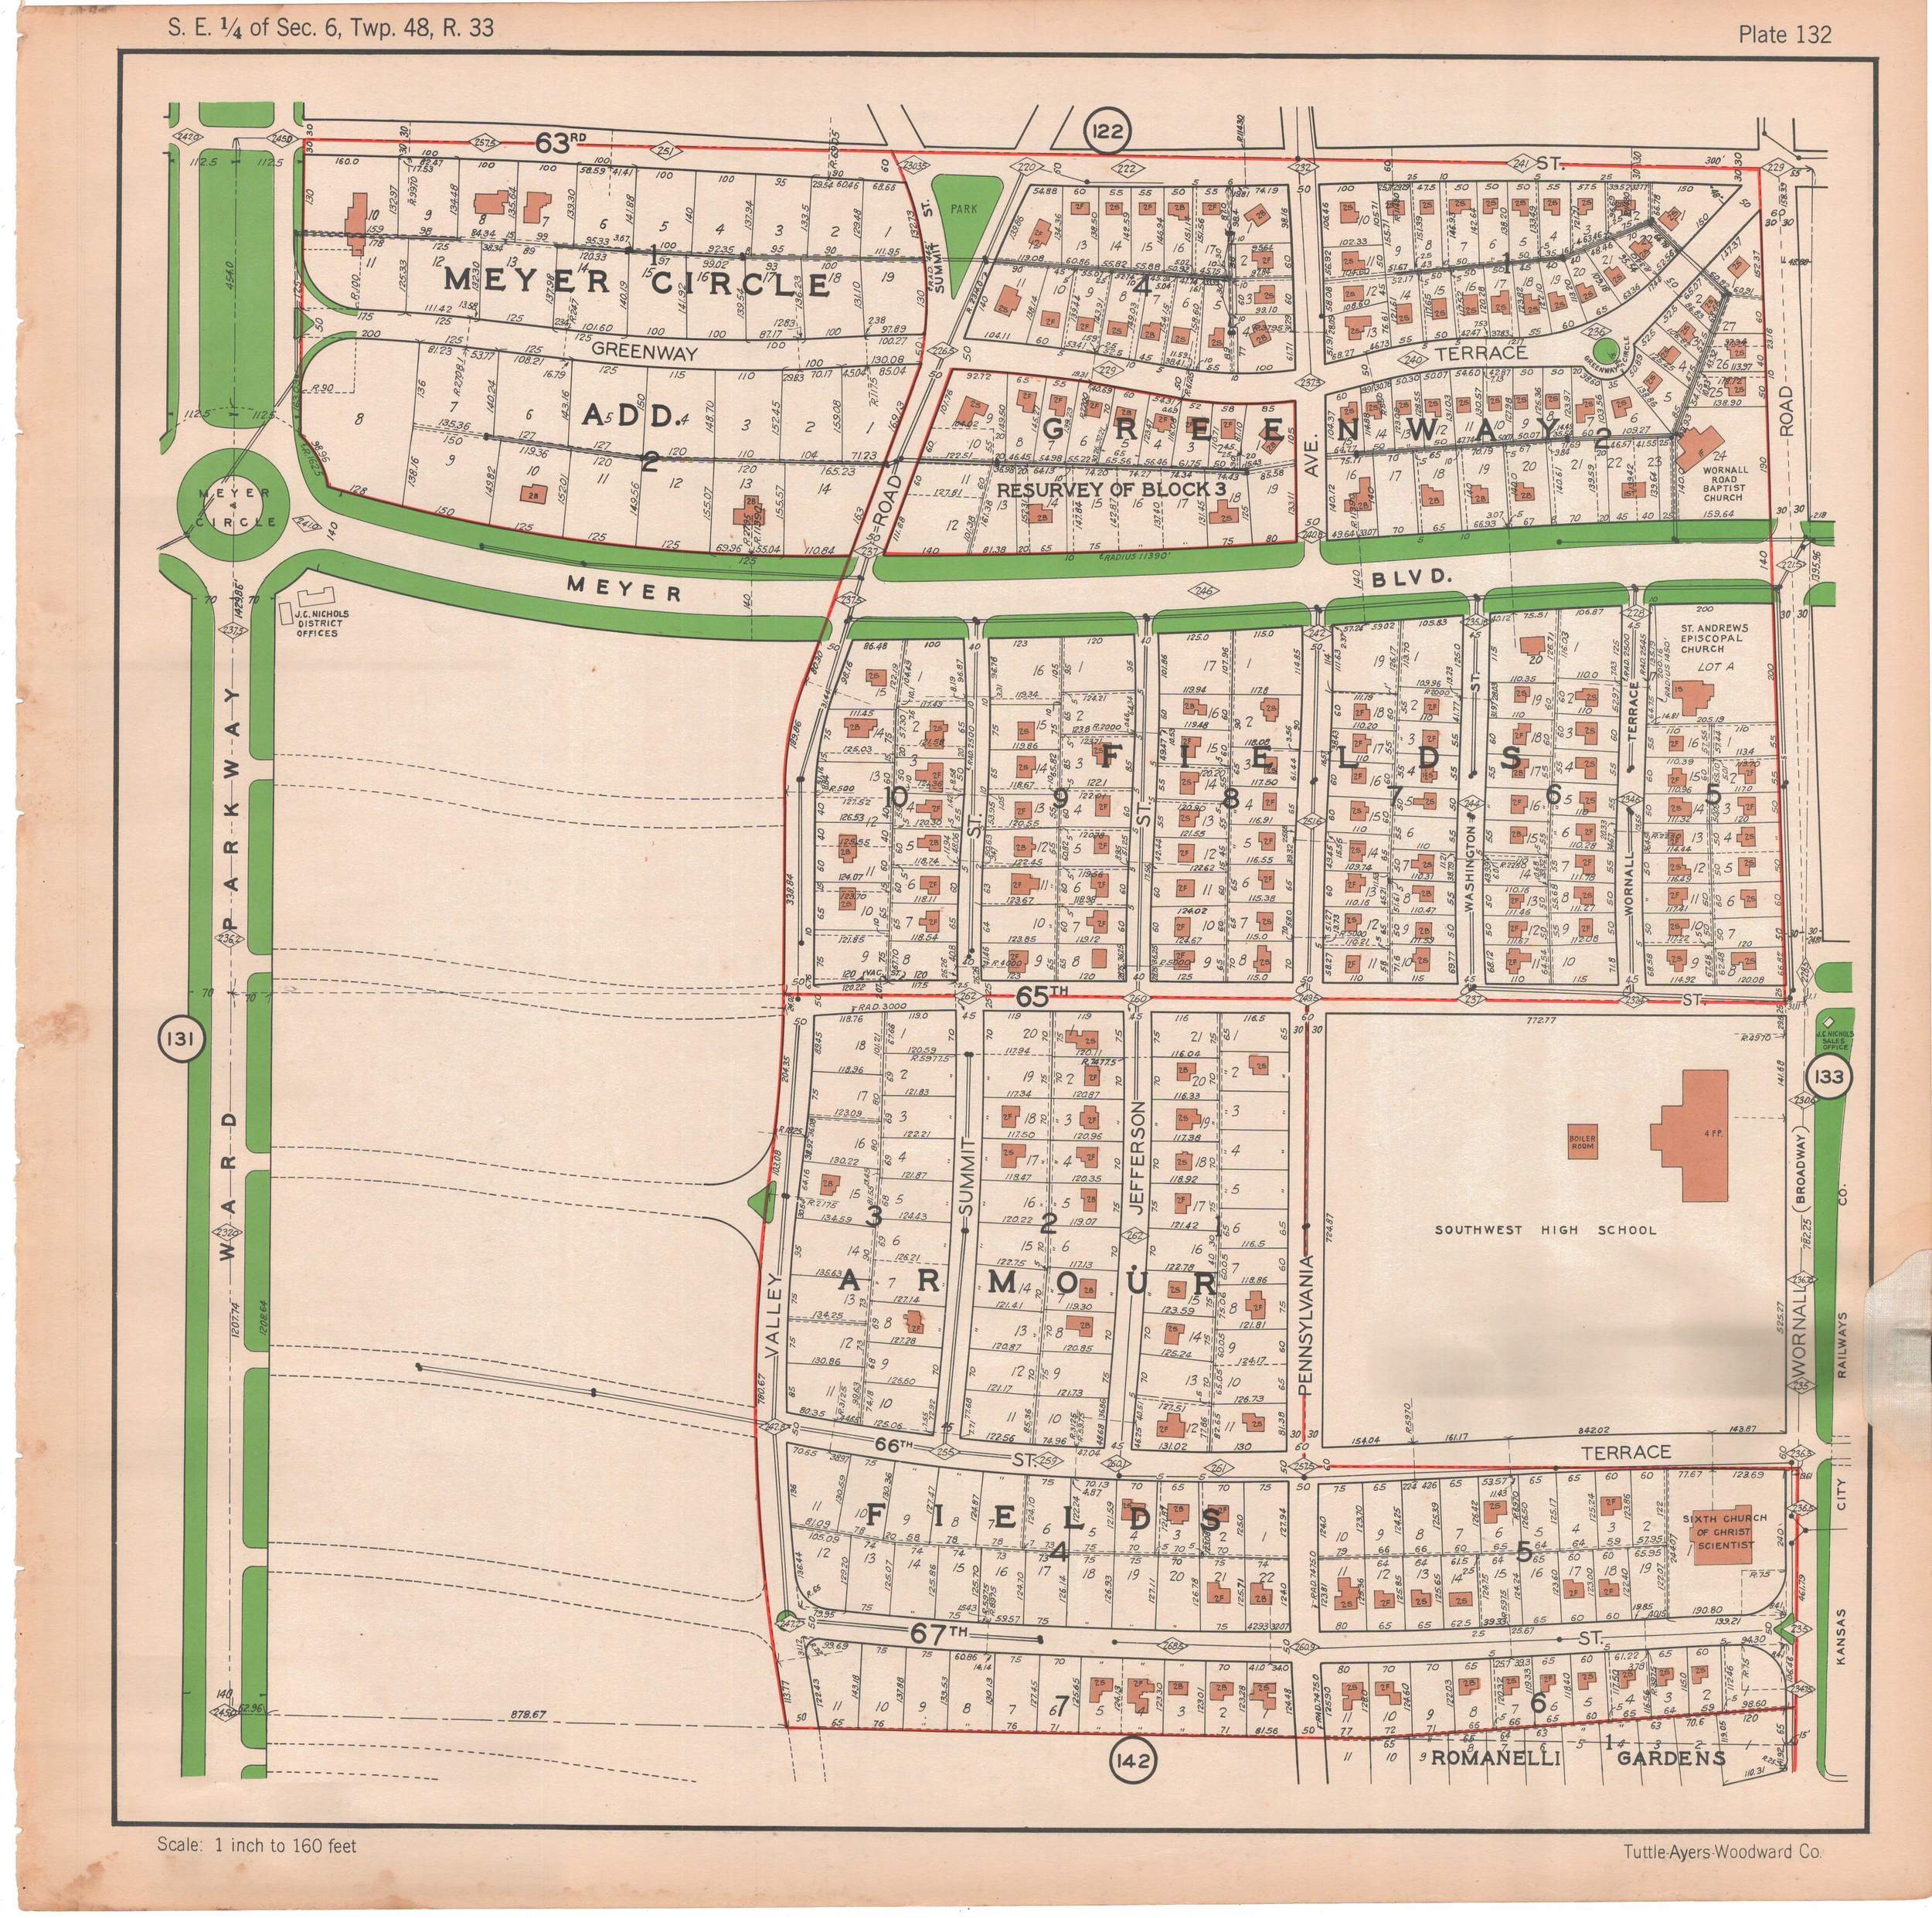 1925 TUTTLE_AYERS_Plate_132.JPG